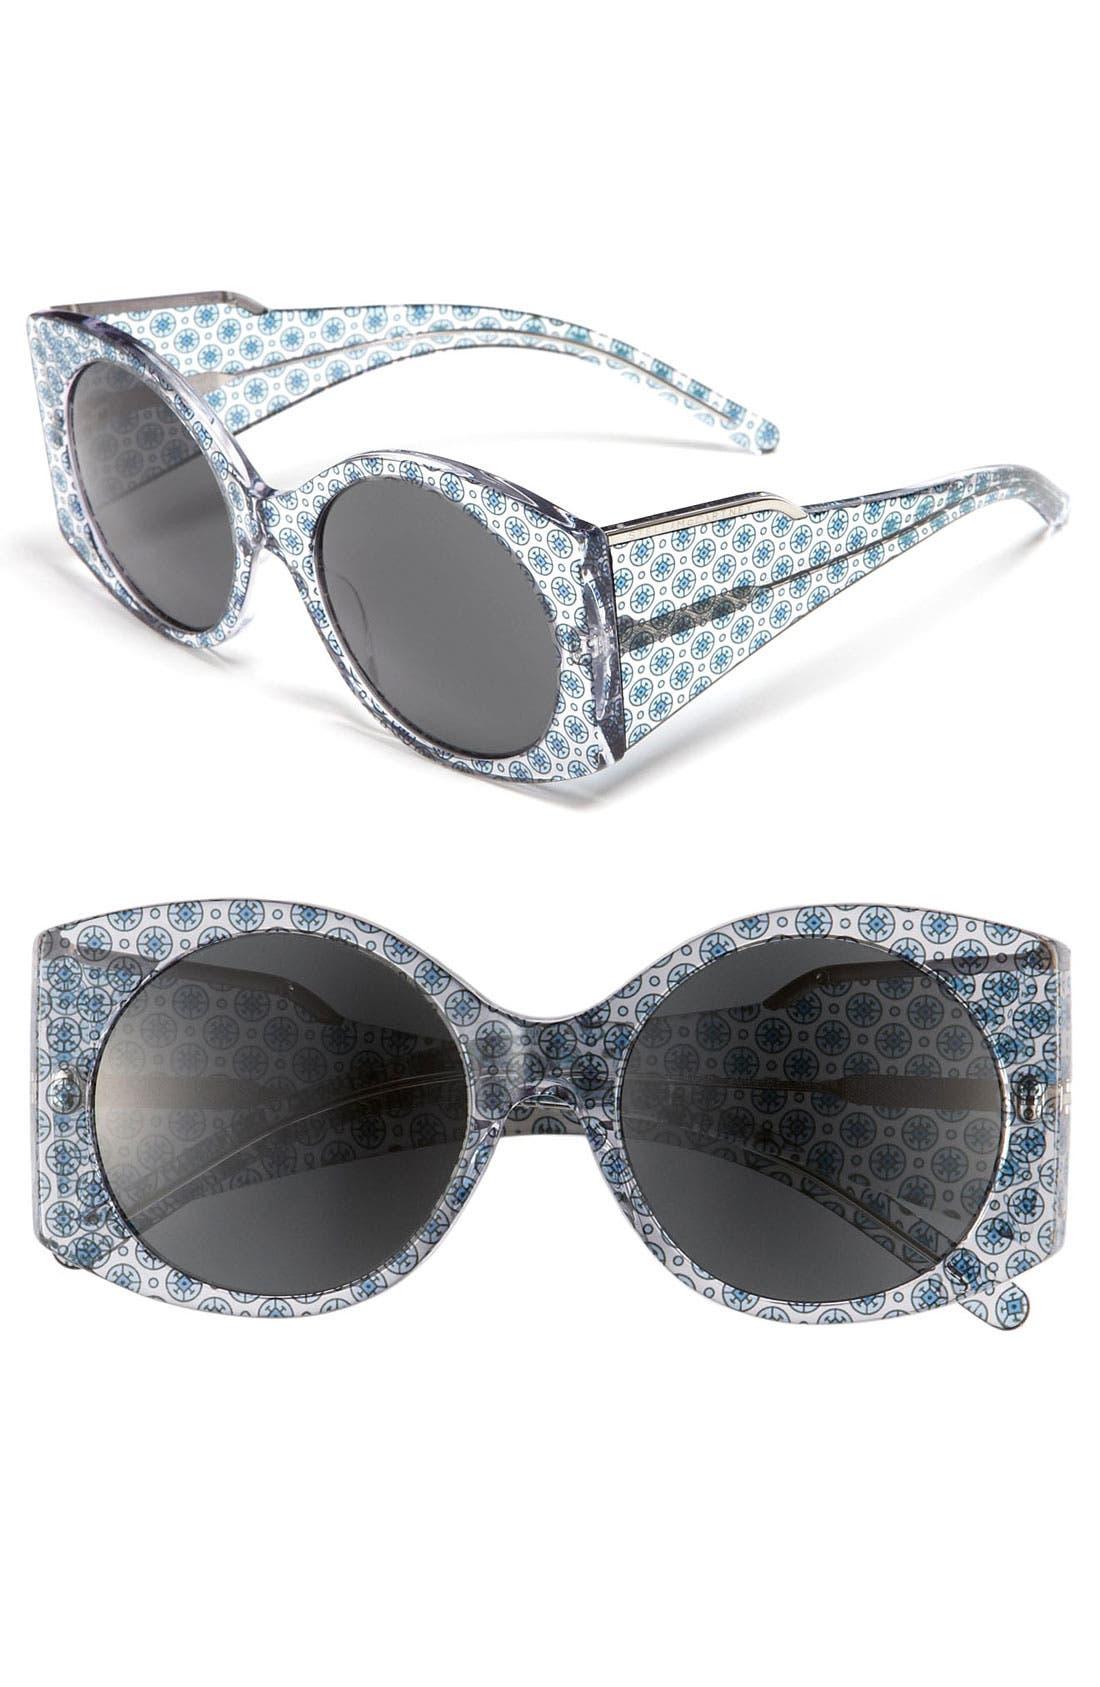 Alternate Image 1 Selected - Stella McCartney 'Summer Runway Collection' Sunglasses